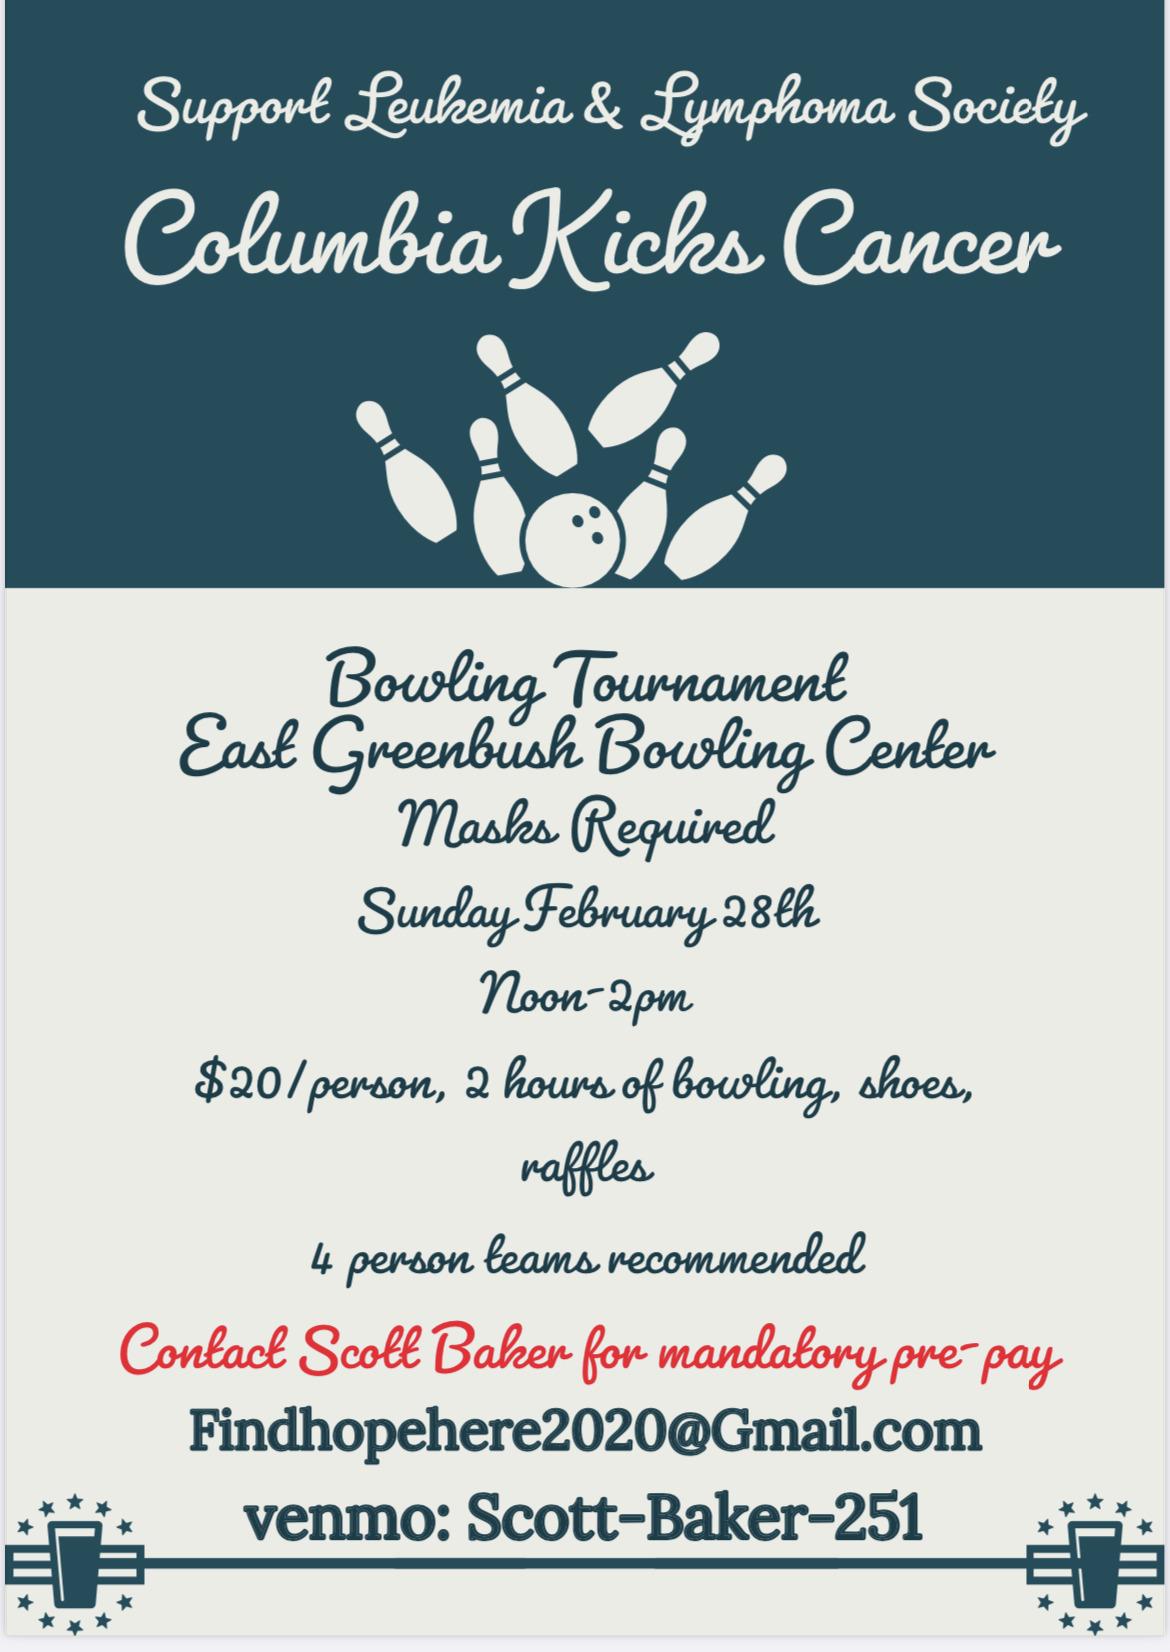 Columbia kicks cancer bowling fundraiser